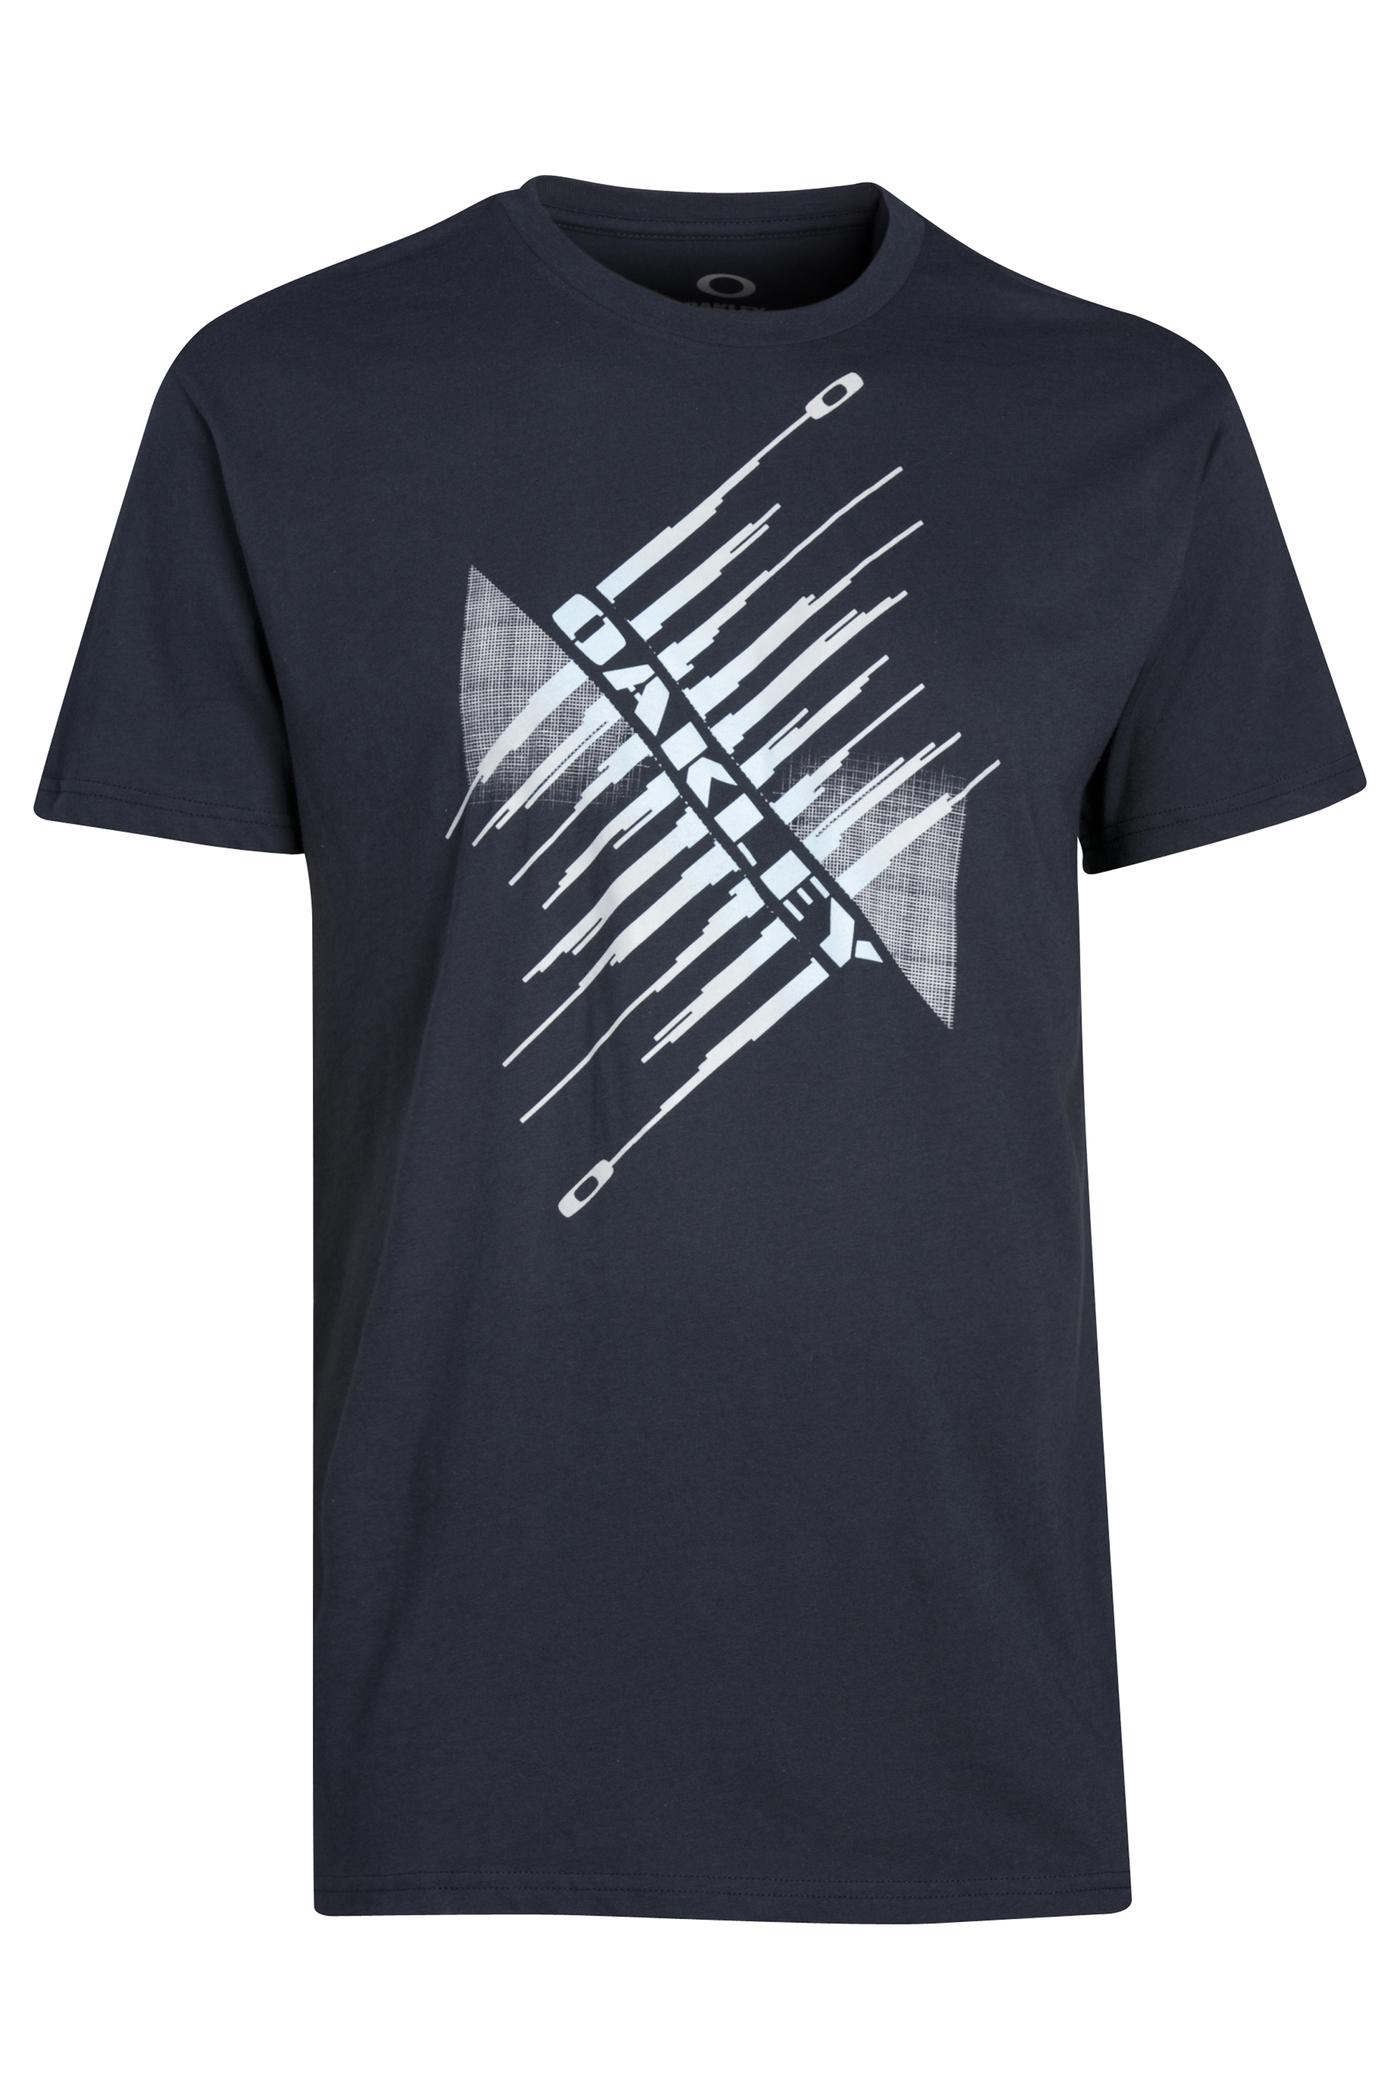 Oakley T-Shirt Sustainable - Navy Blauw